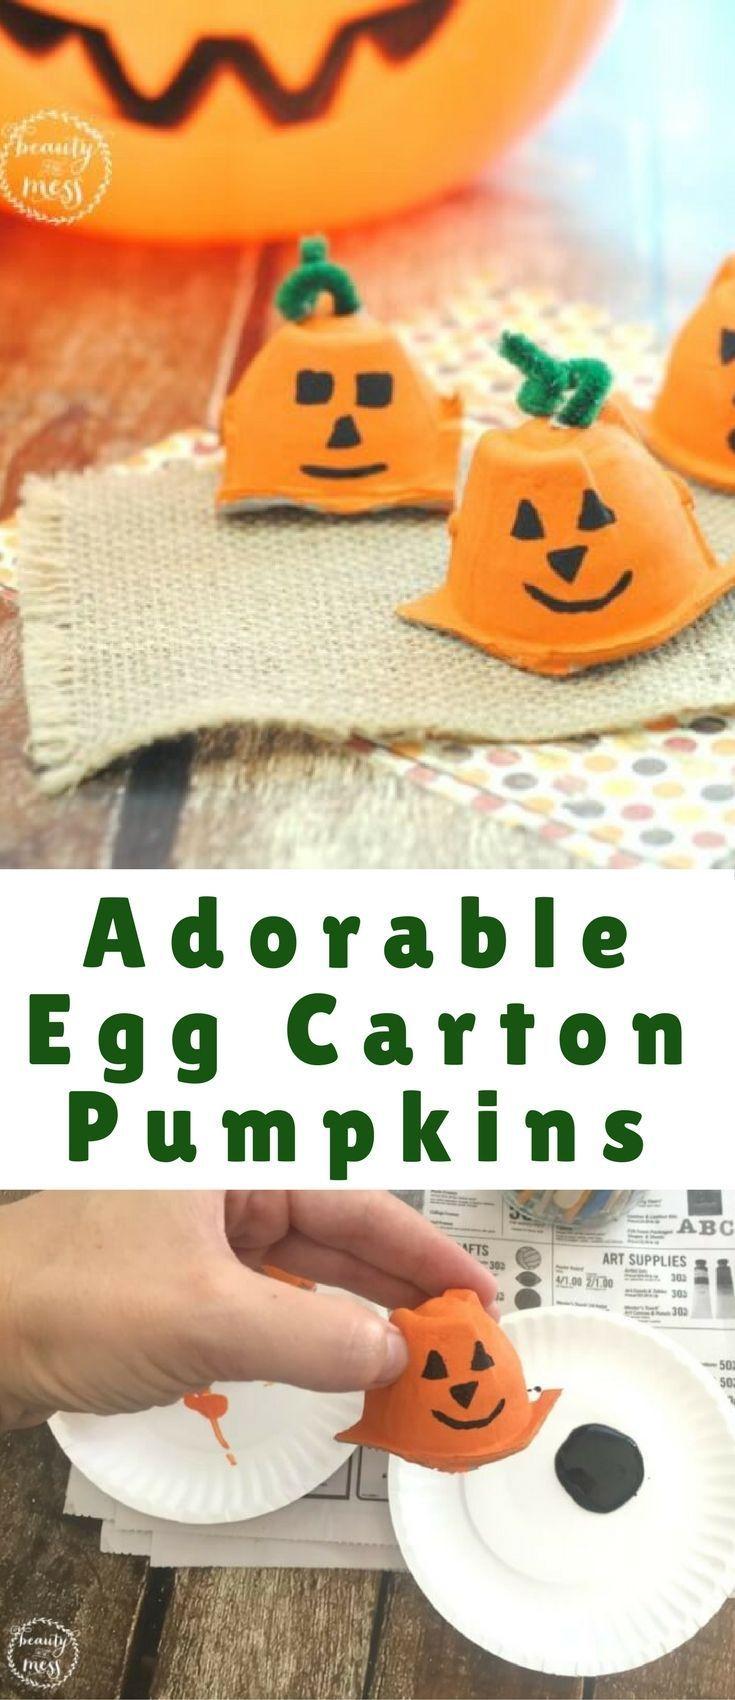 Check out these adorable egg carton pumpkins for F...